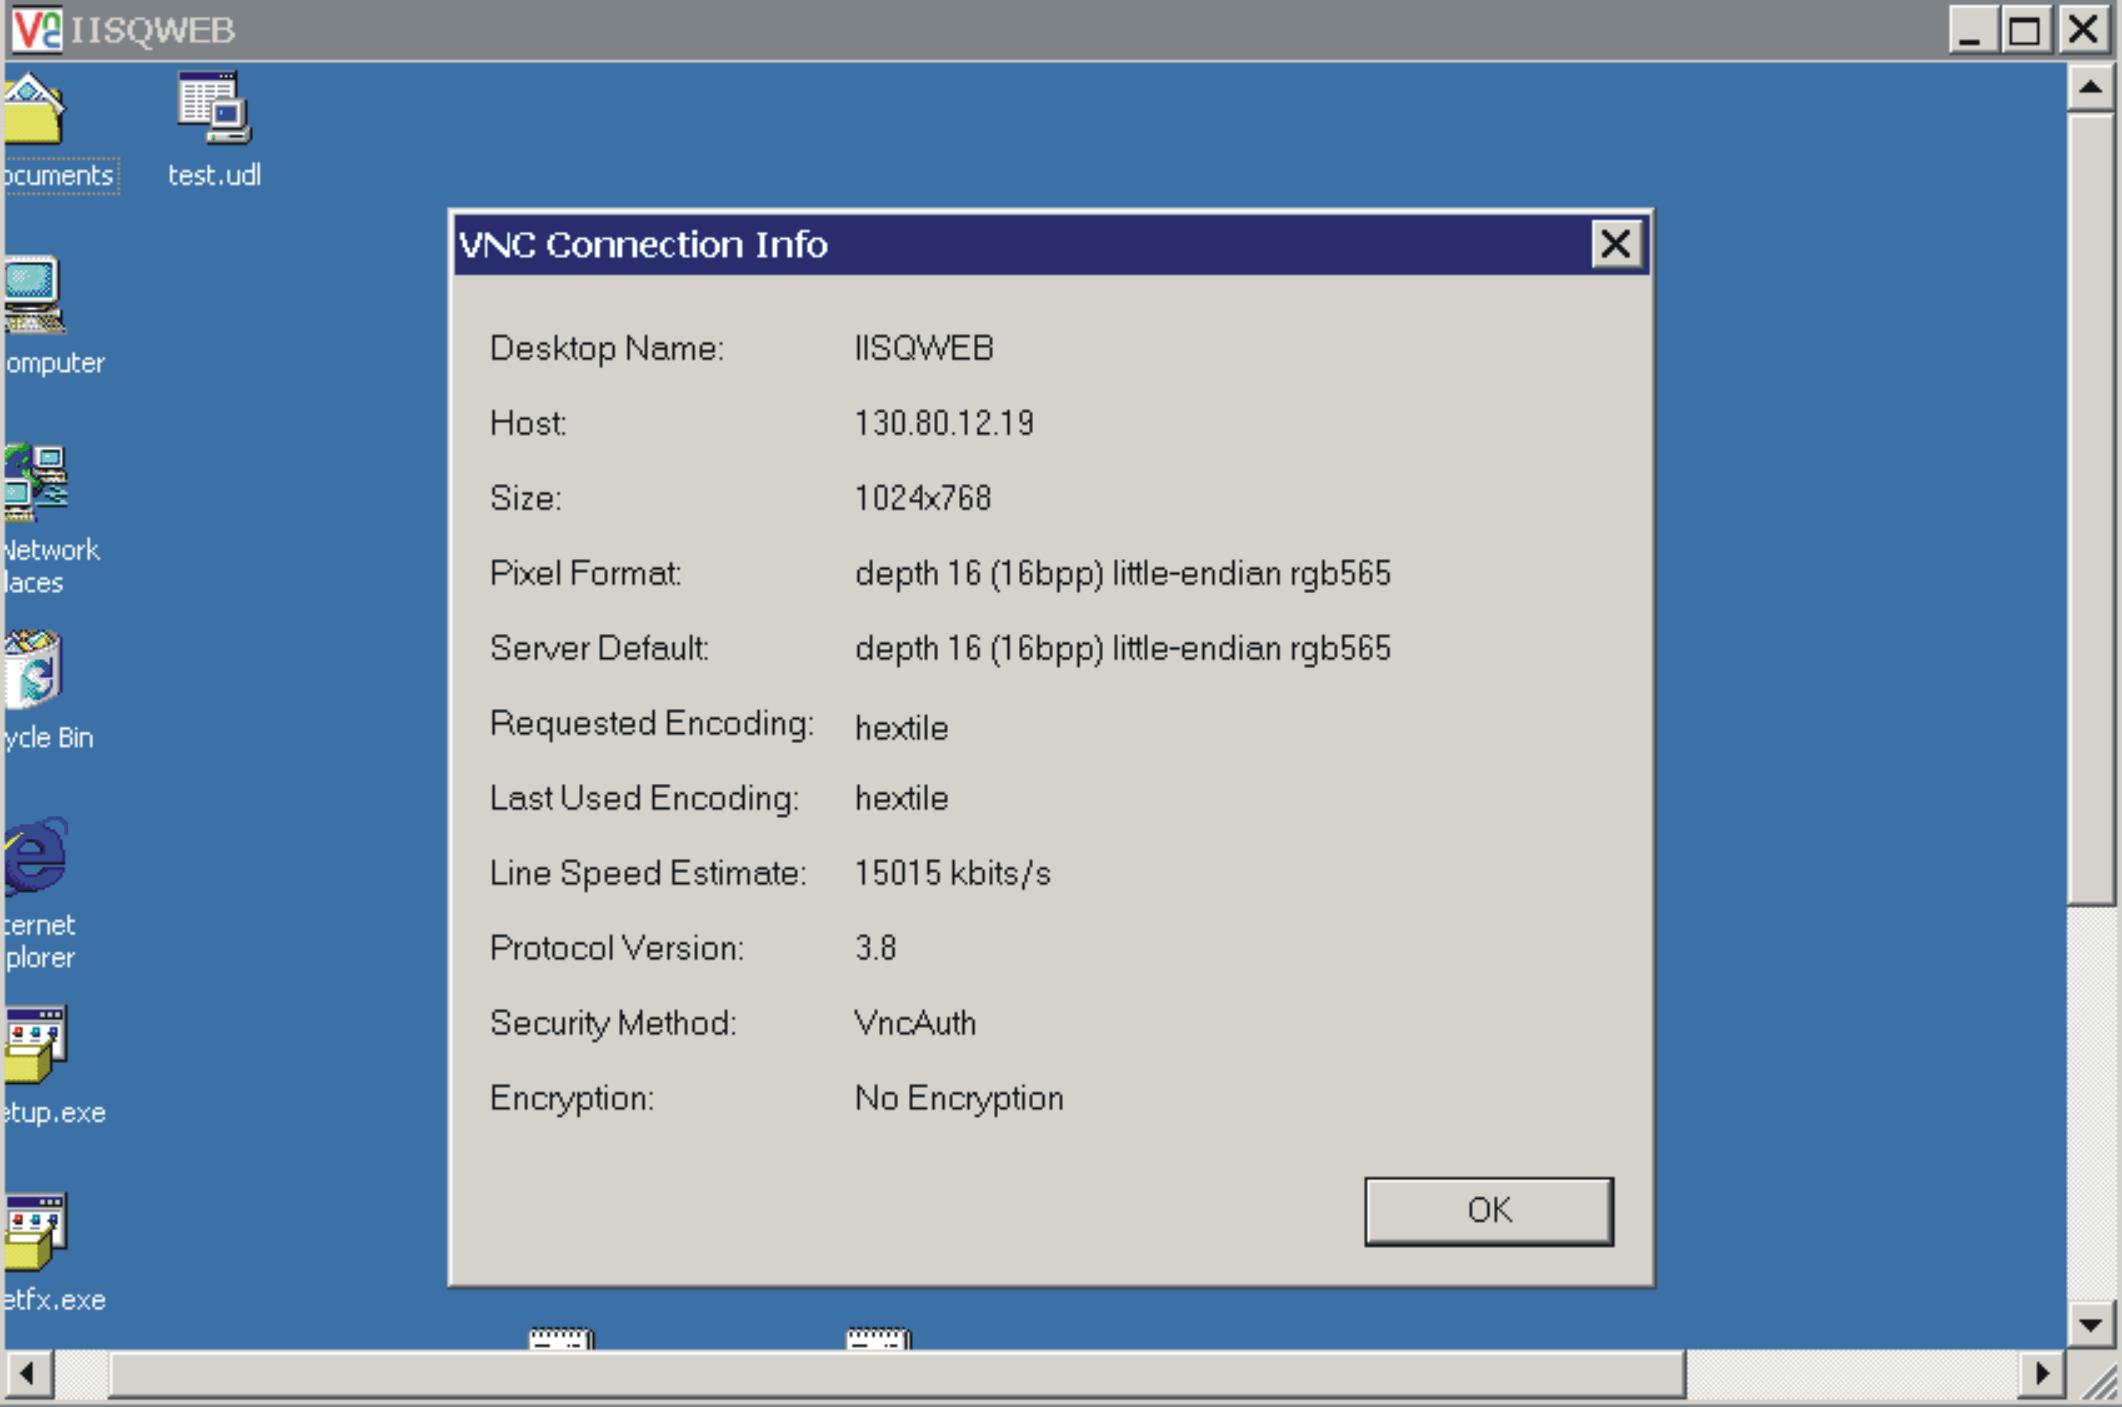 Controlling a remote server